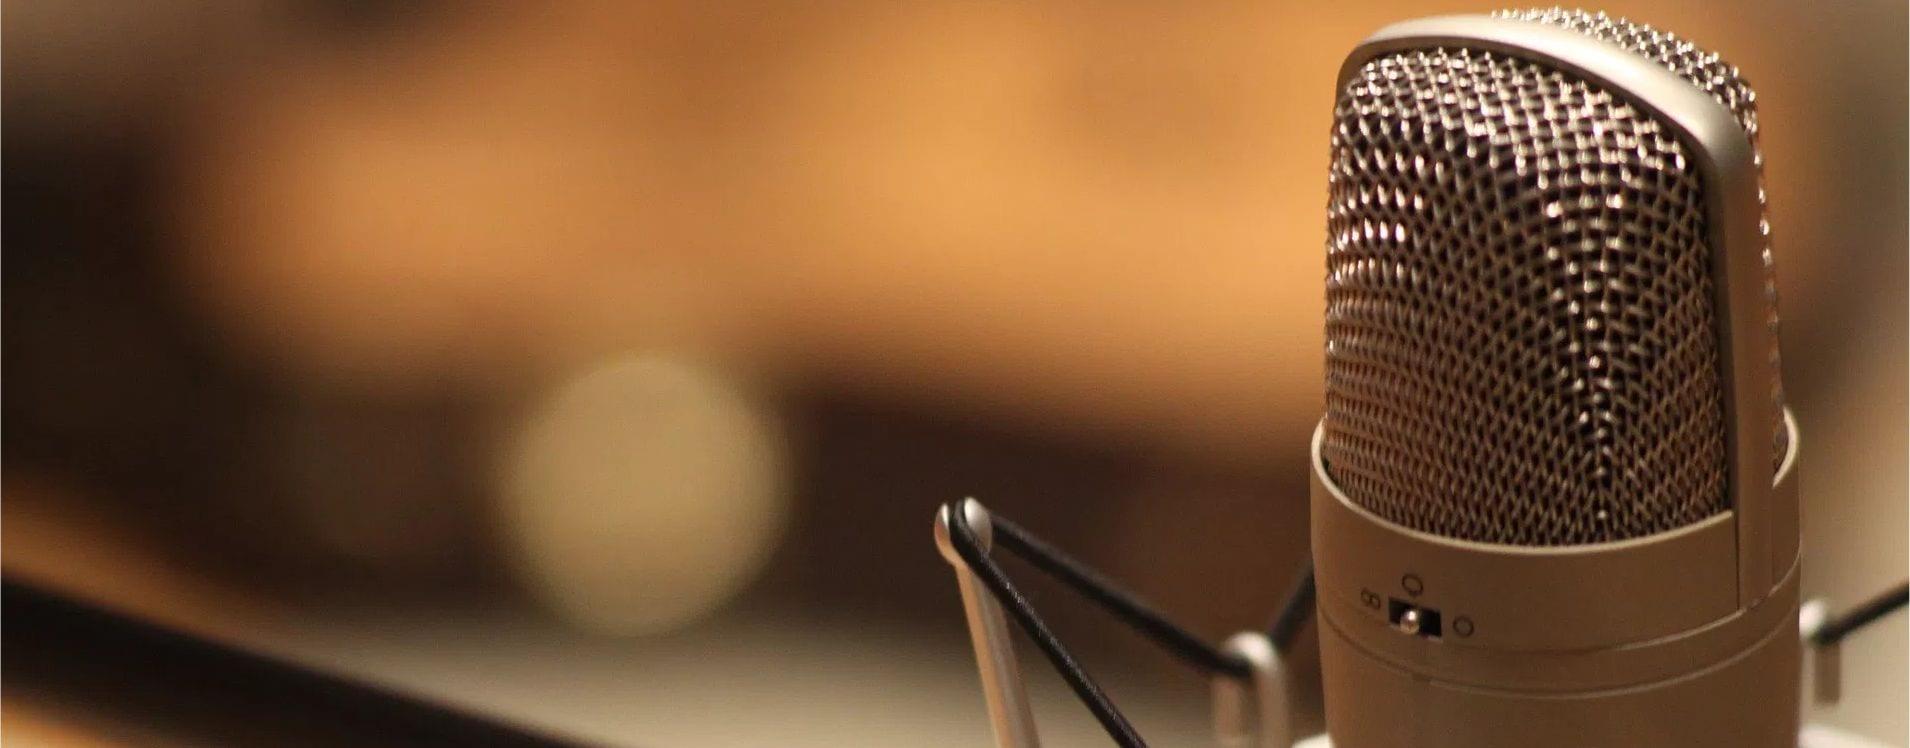 microfono head